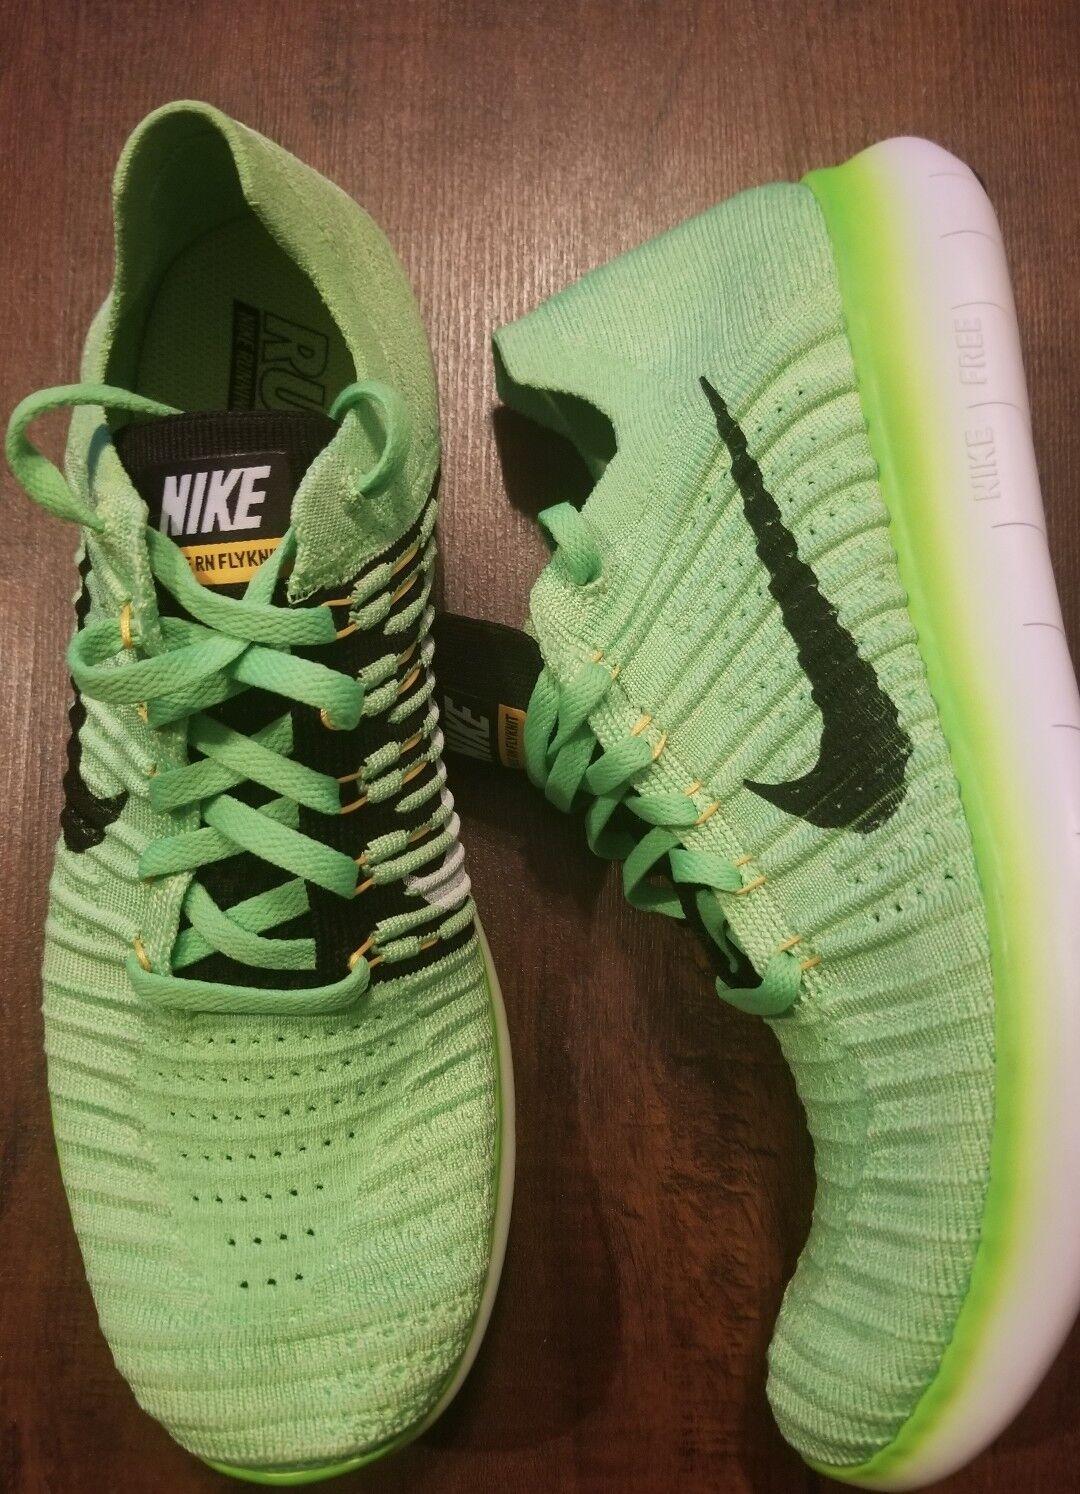 NIKE Free RN Flyknit Mens Sz 10 shoes NEON Green 831069 300